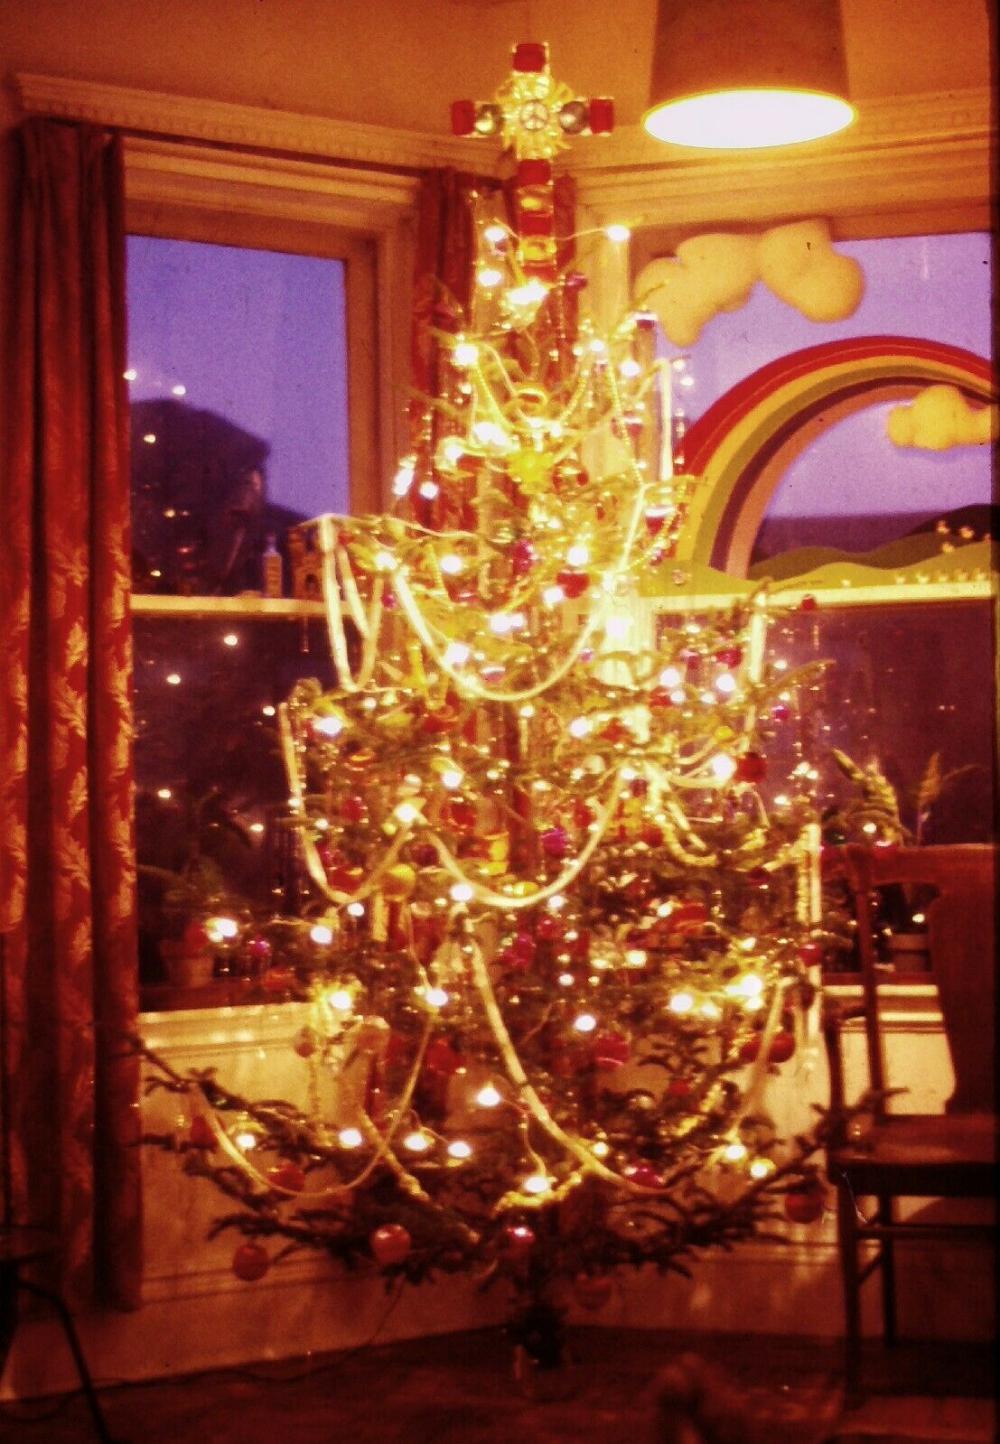 House Christmas Lights San Francisco 2020 A Happy Hippy Tree in 2020   Christmas tree lighting, San